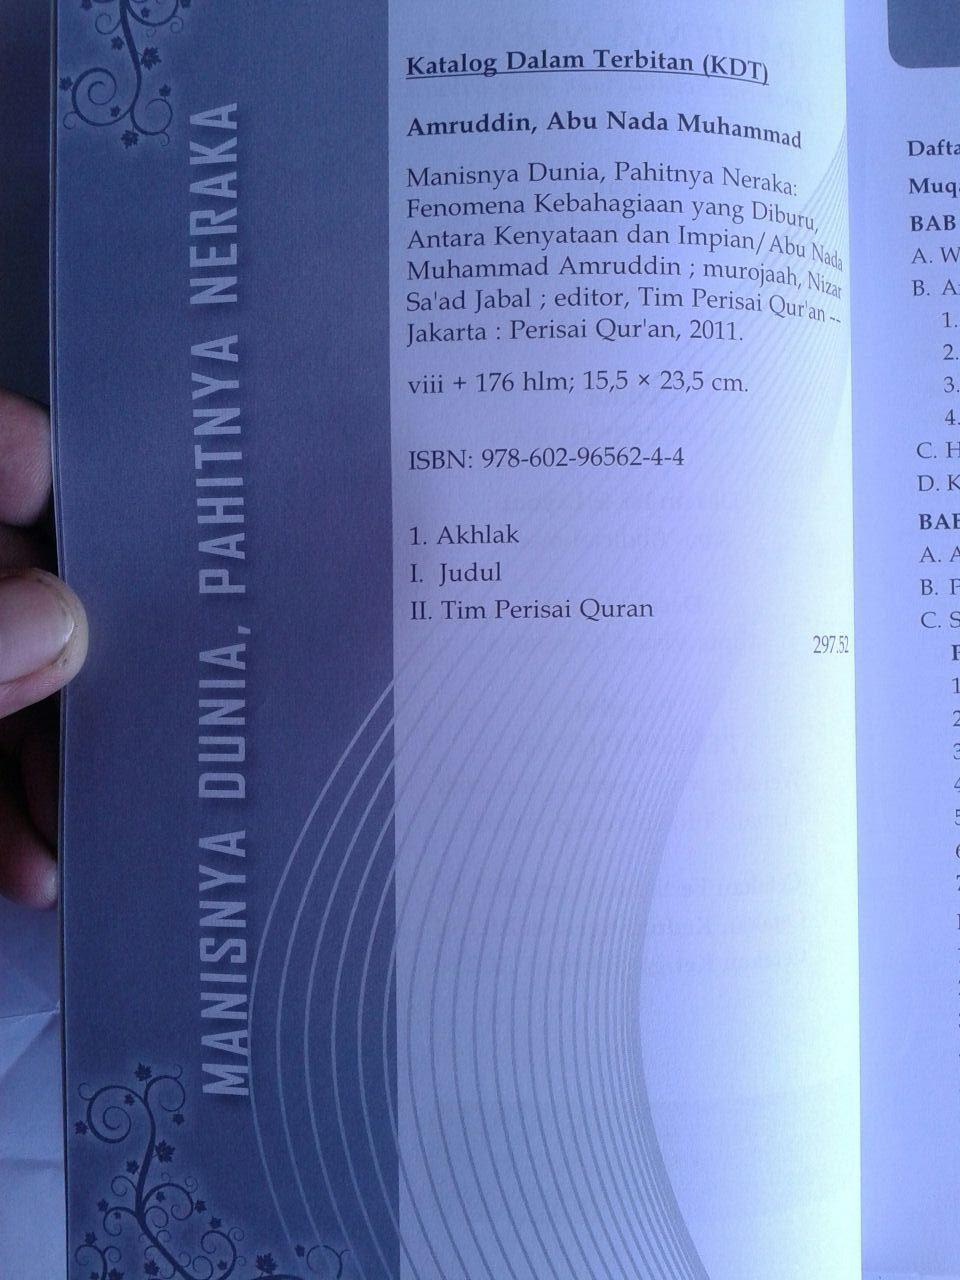 Buku Manisnya Dunia Pahitnya Neraka isi 3